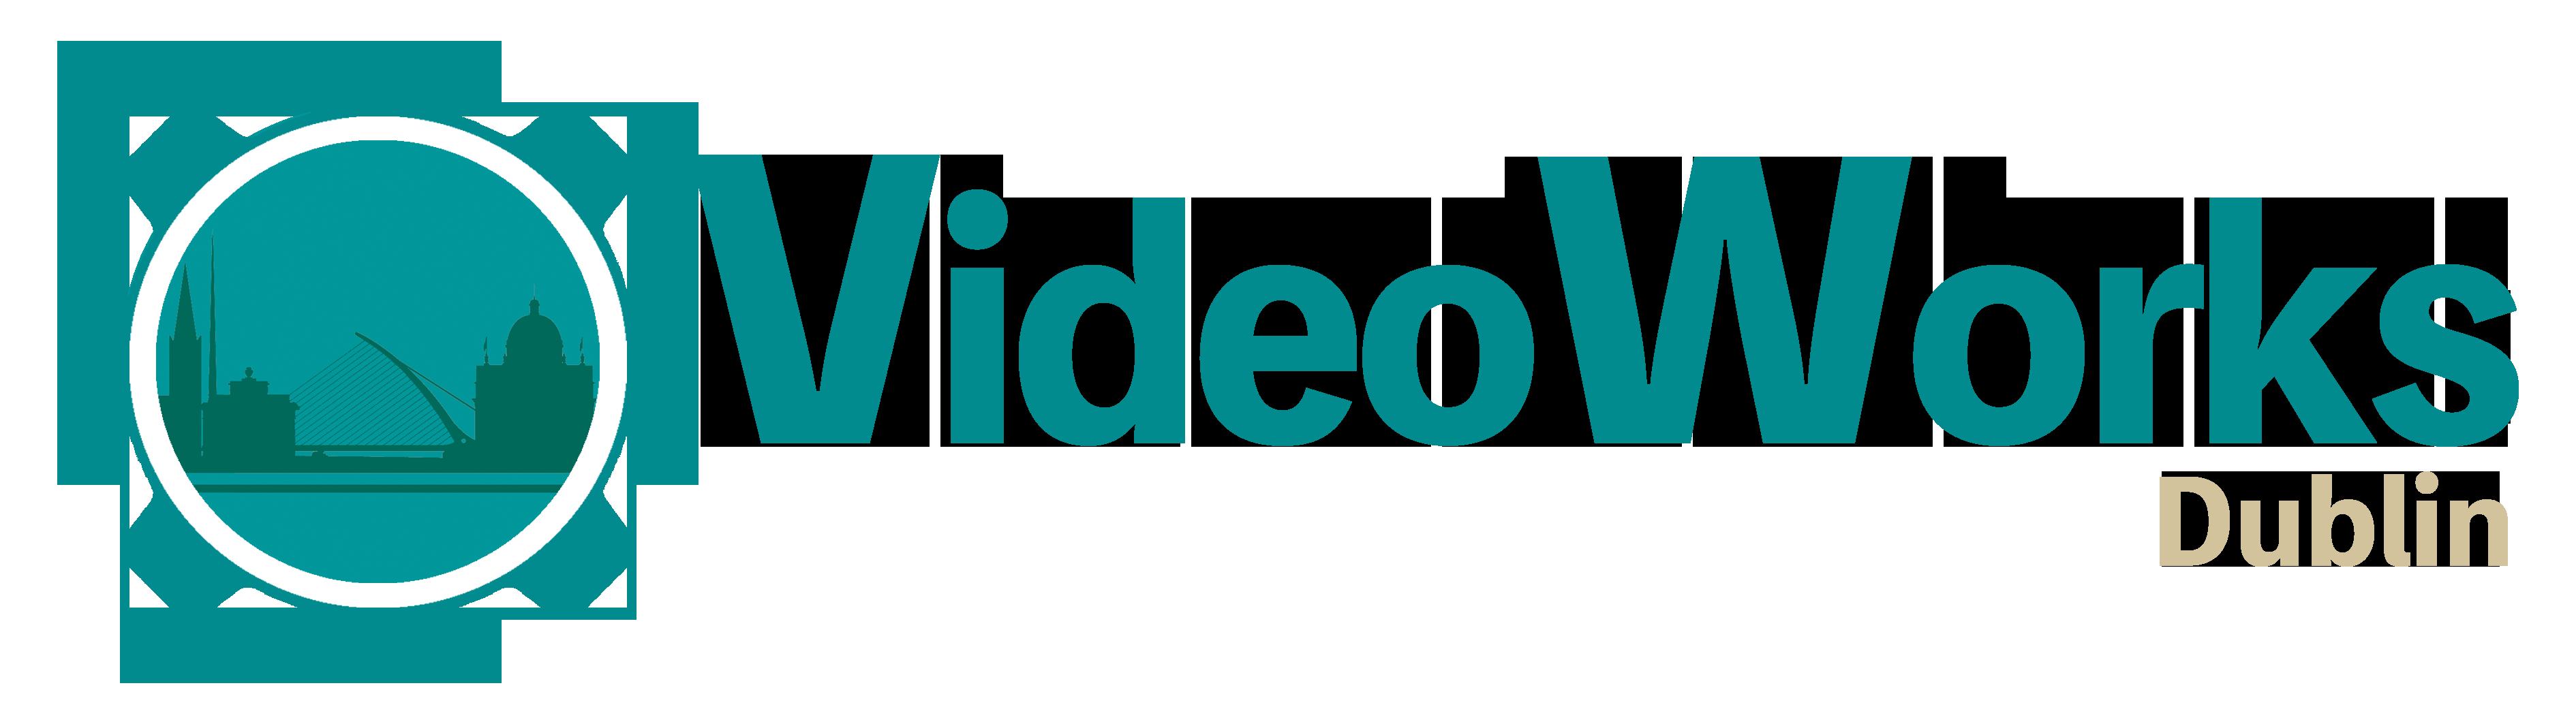 VideoWorks | Video Production Company | Dublin Ireland